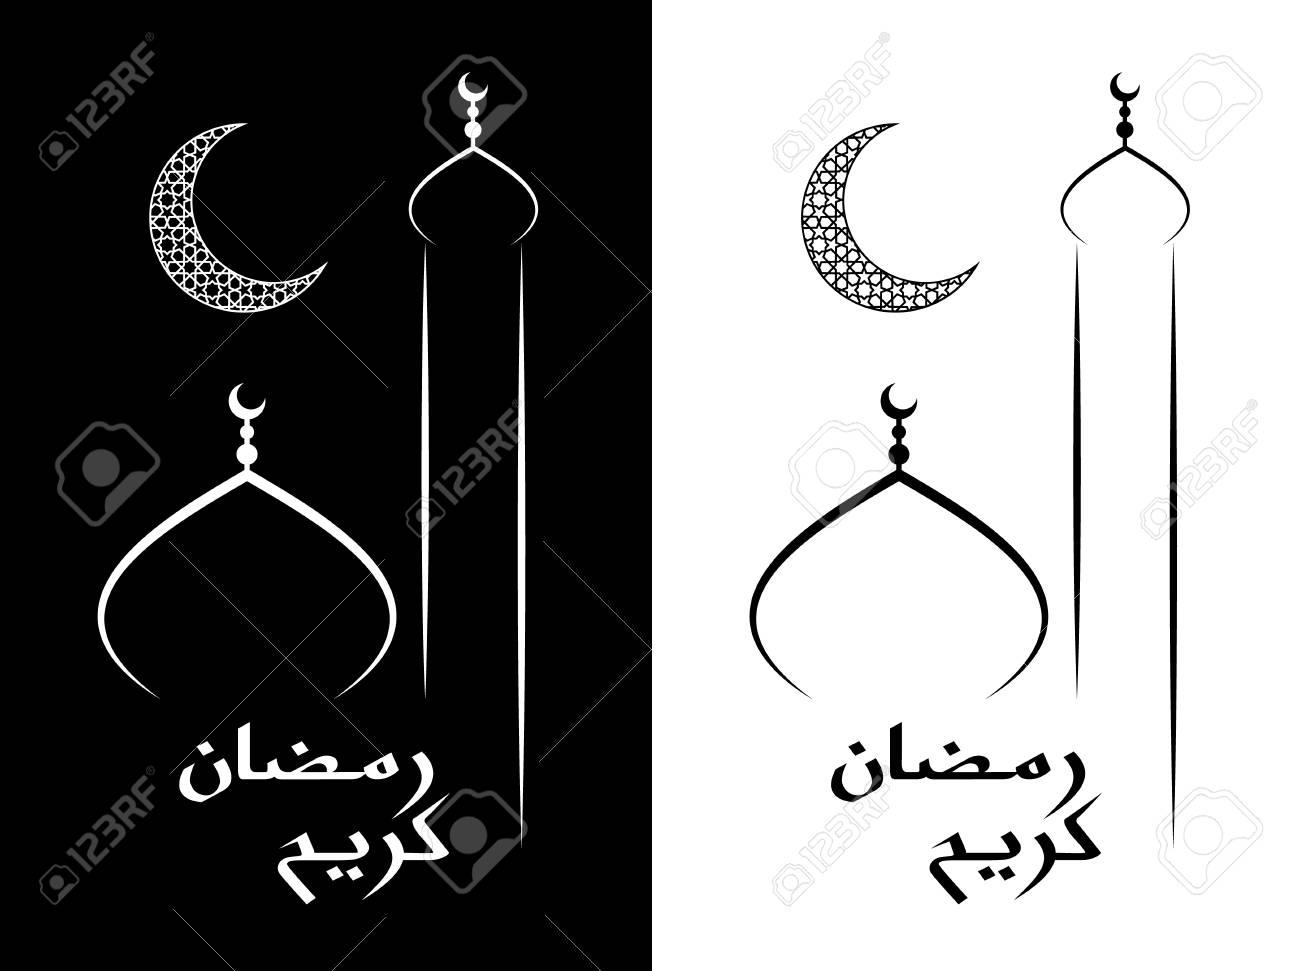 Set of ramadan greeting cards on white and black backgrounds set of ramadan greeting cards on white and black backgrounds vector illustration ramadan kareem m4hsunfo